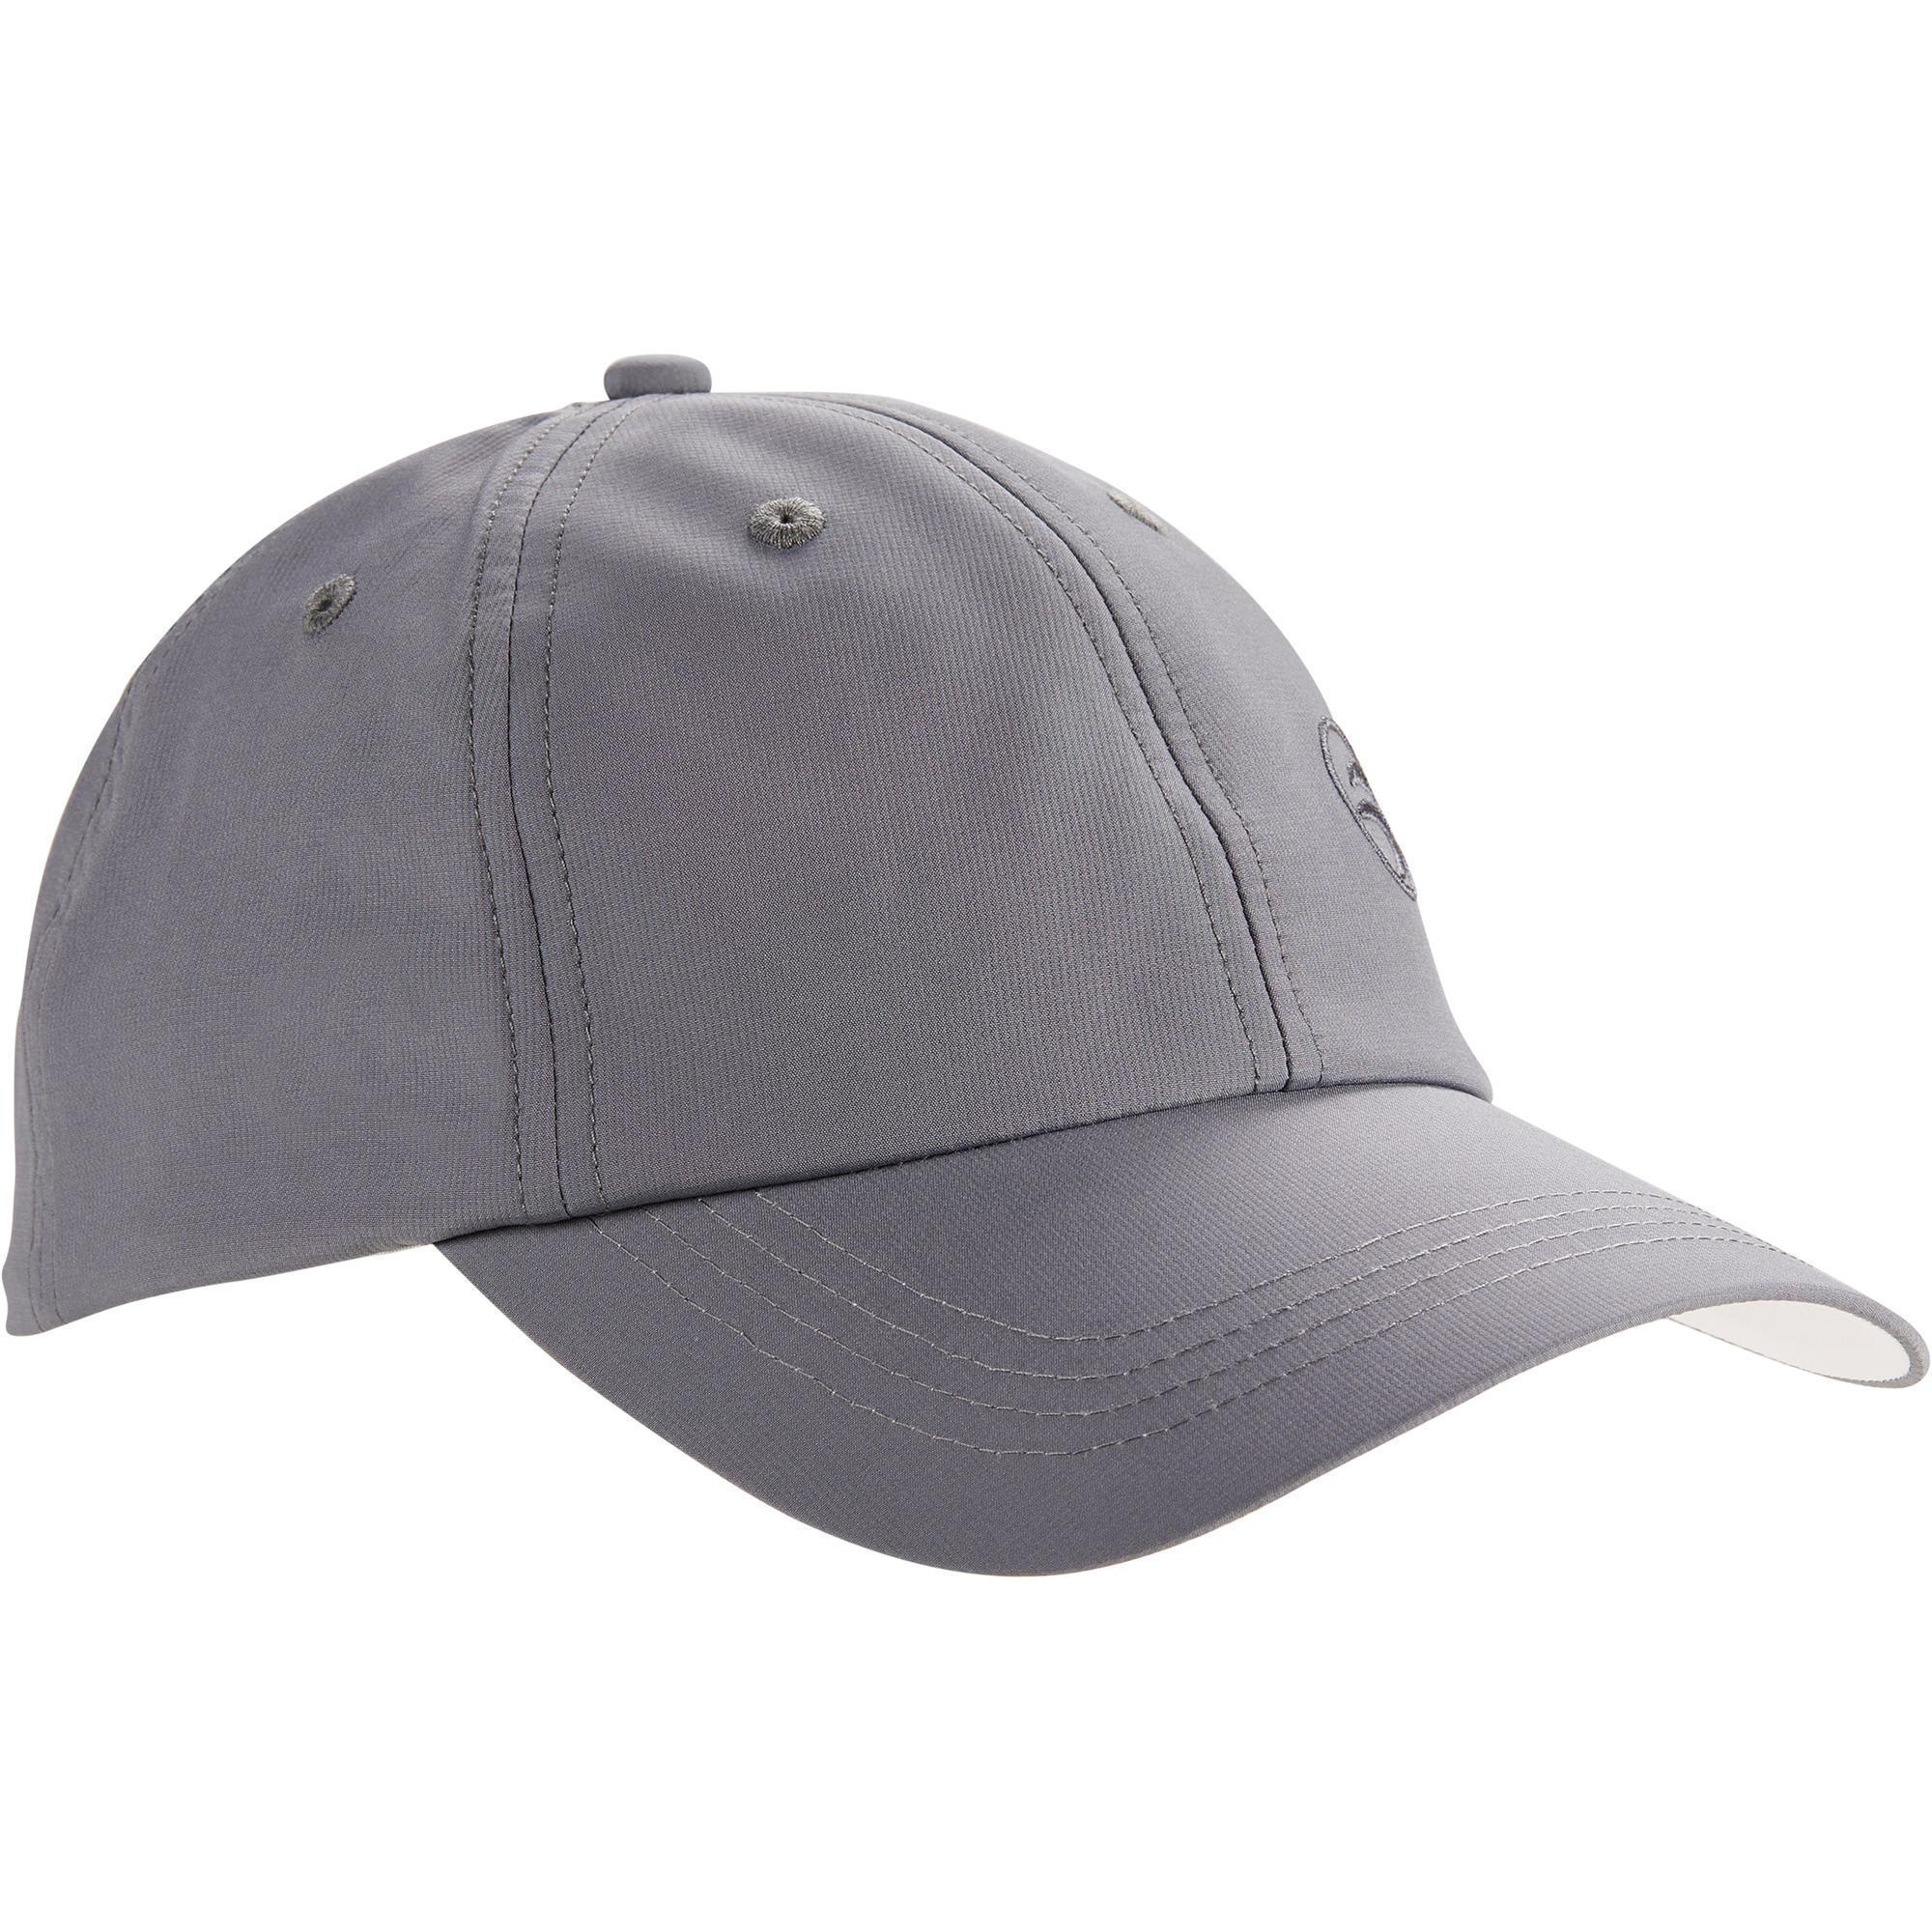 Golf Cap Erwachsene dunkelgrau | Accessoires > Caps > Sonstige Caps | Grau | Inesis